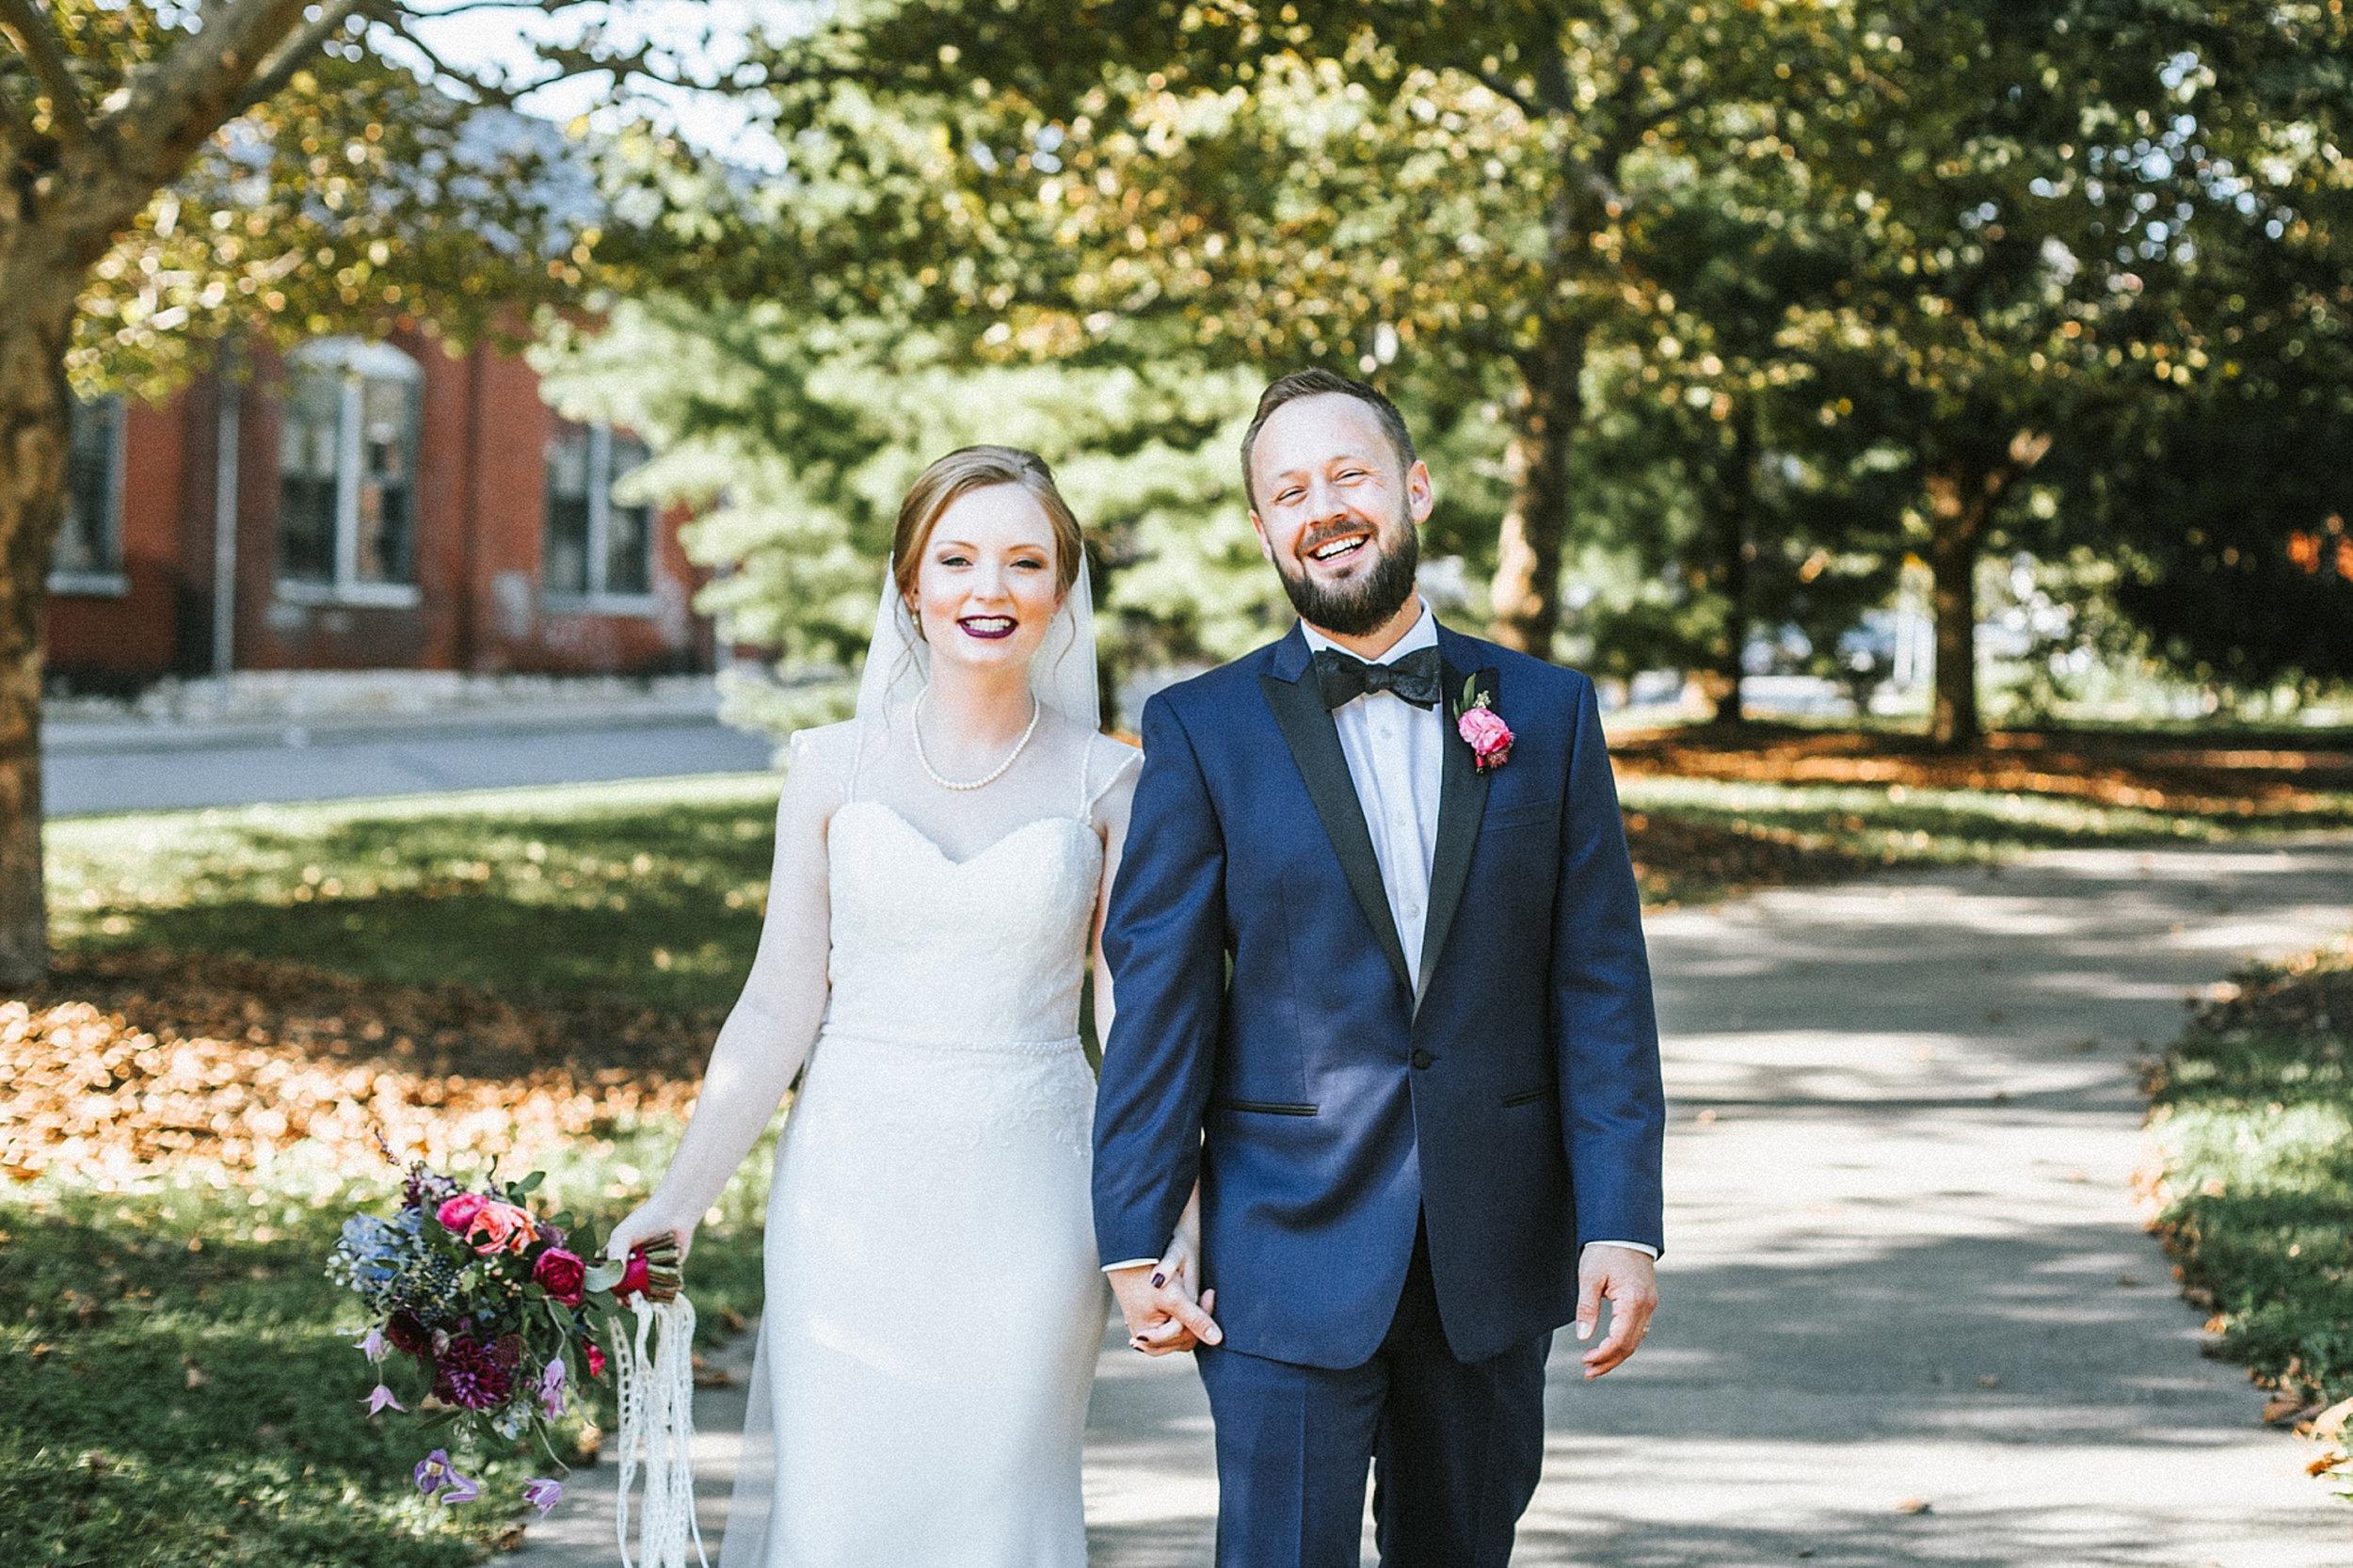 Brooke Townsend Photography - Ohio Wedding Photographer-150.jpg